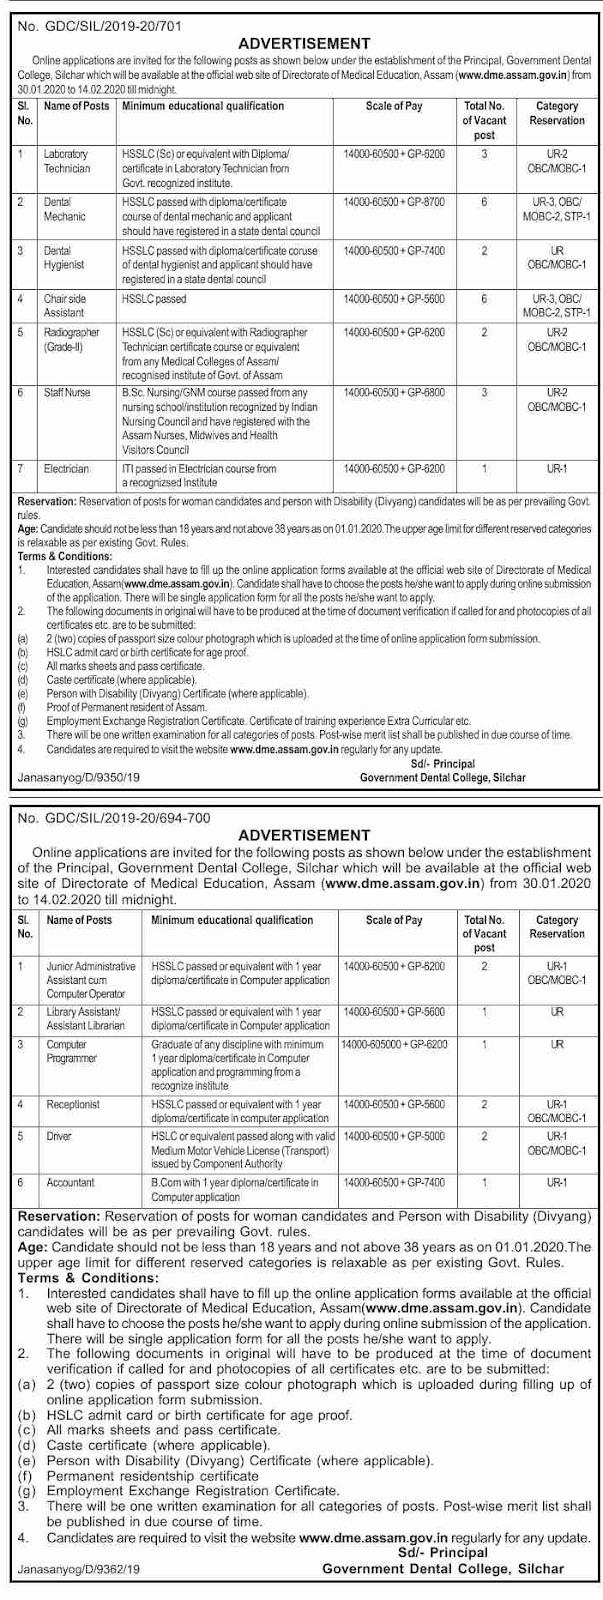 Government Dental College Silchar Recruitment